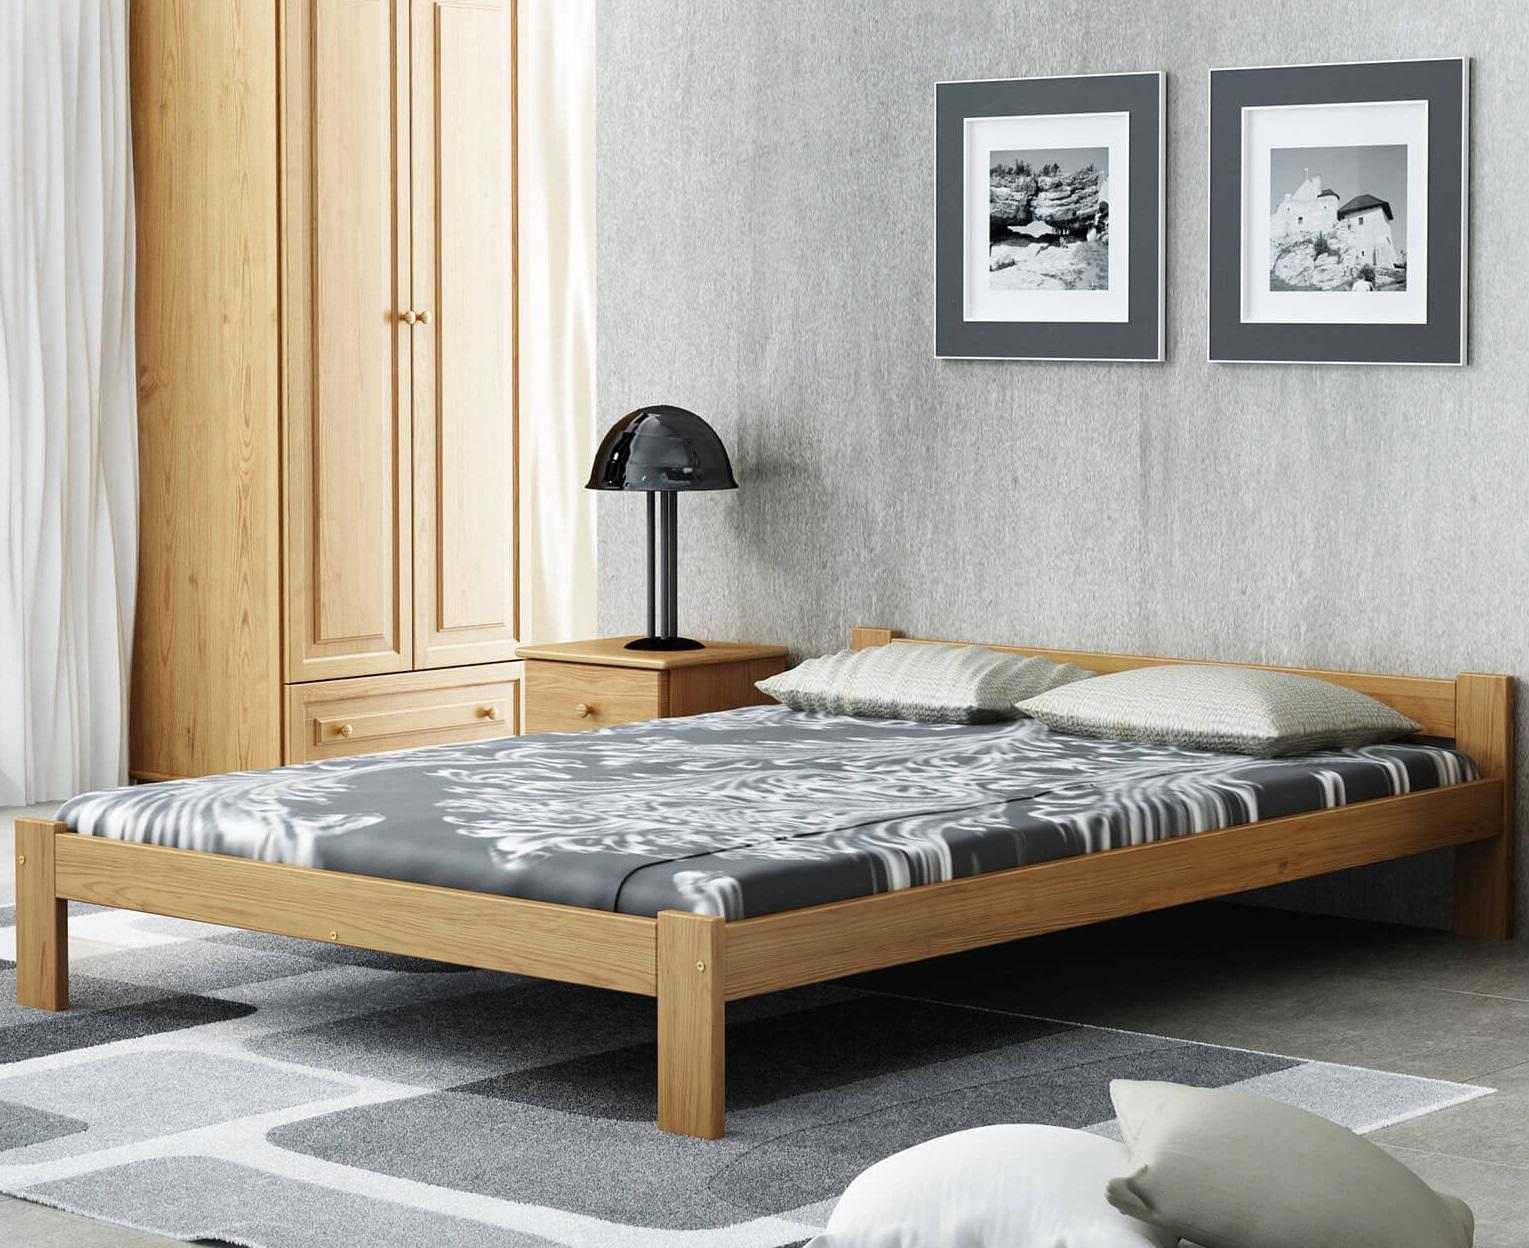 Isao VitBed ágy120x200cm tölgy